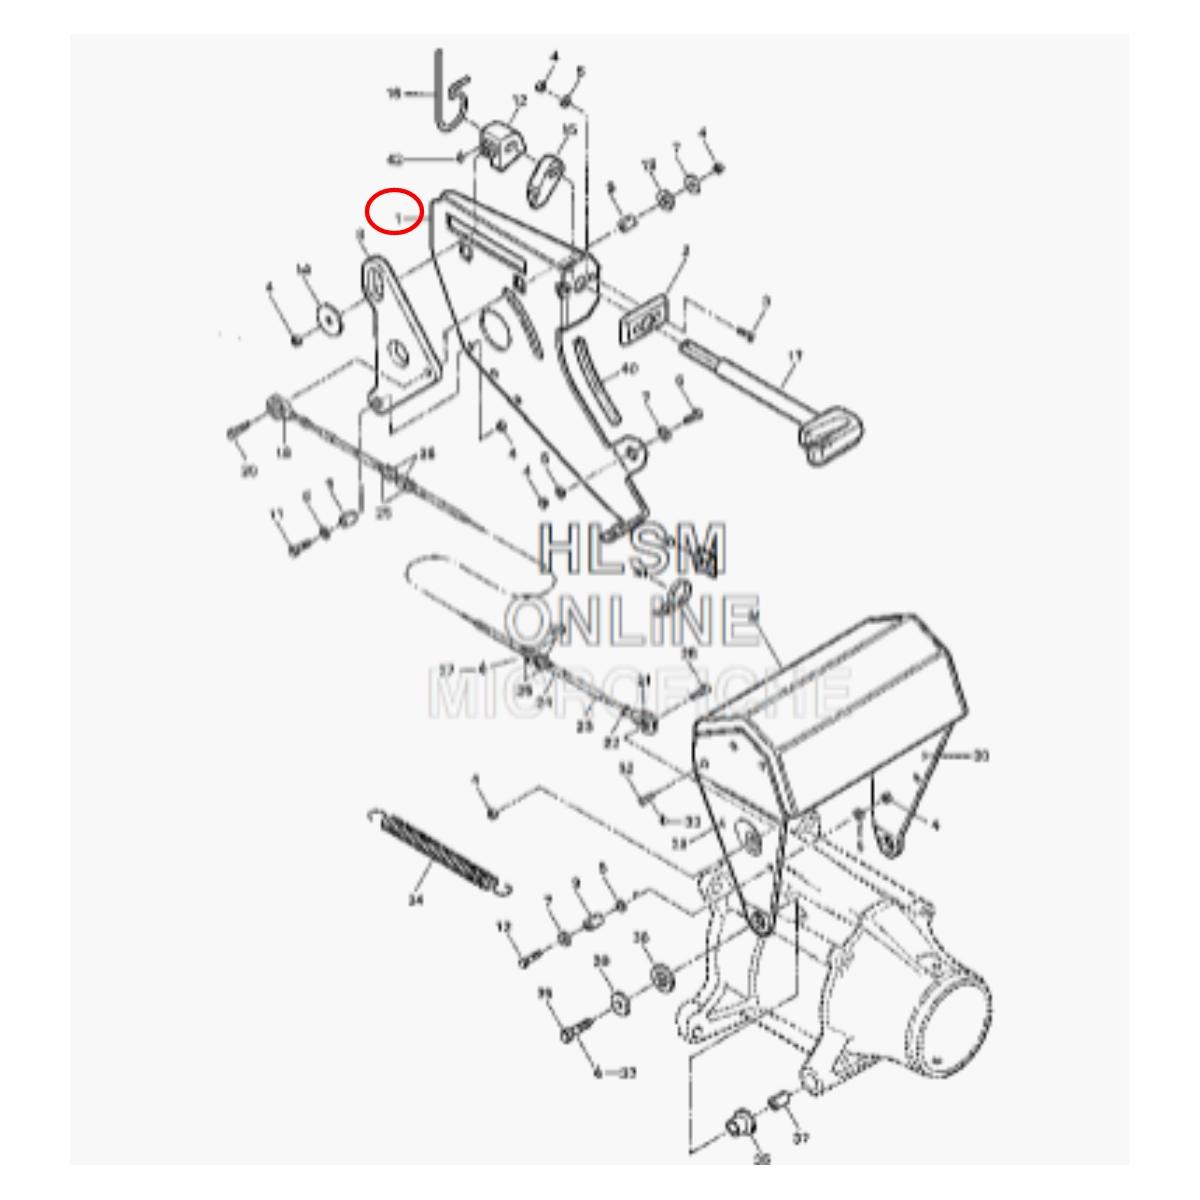 Placa Fixação Alavanca Ré para Jet Ski Sea Doo GT 91  - Radical Peças - Peças para Jet Ski